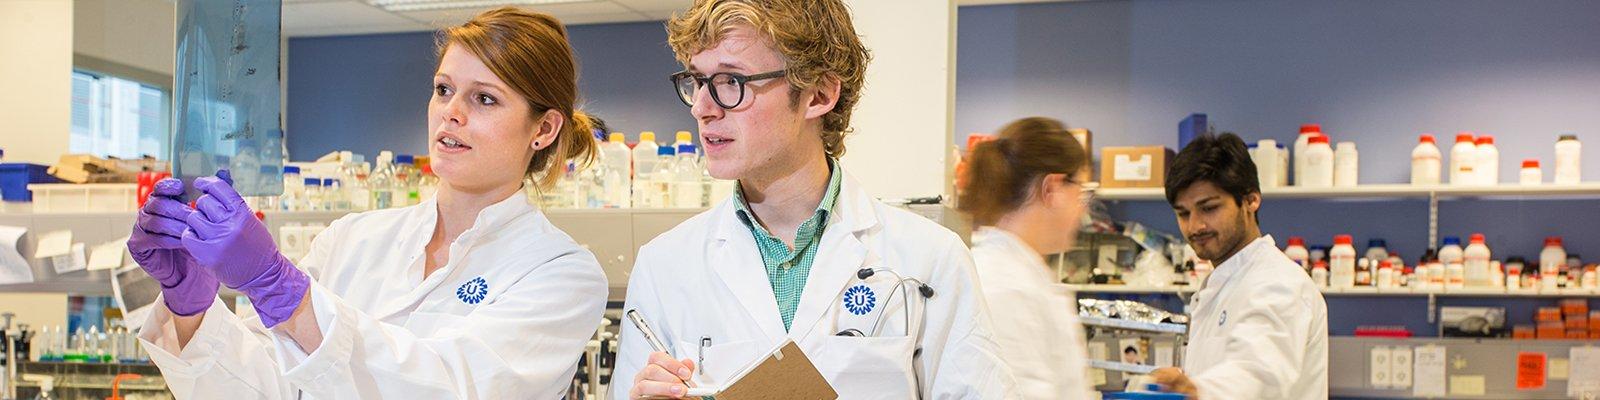 Faculteit Geneeskunde UMC Utrecht